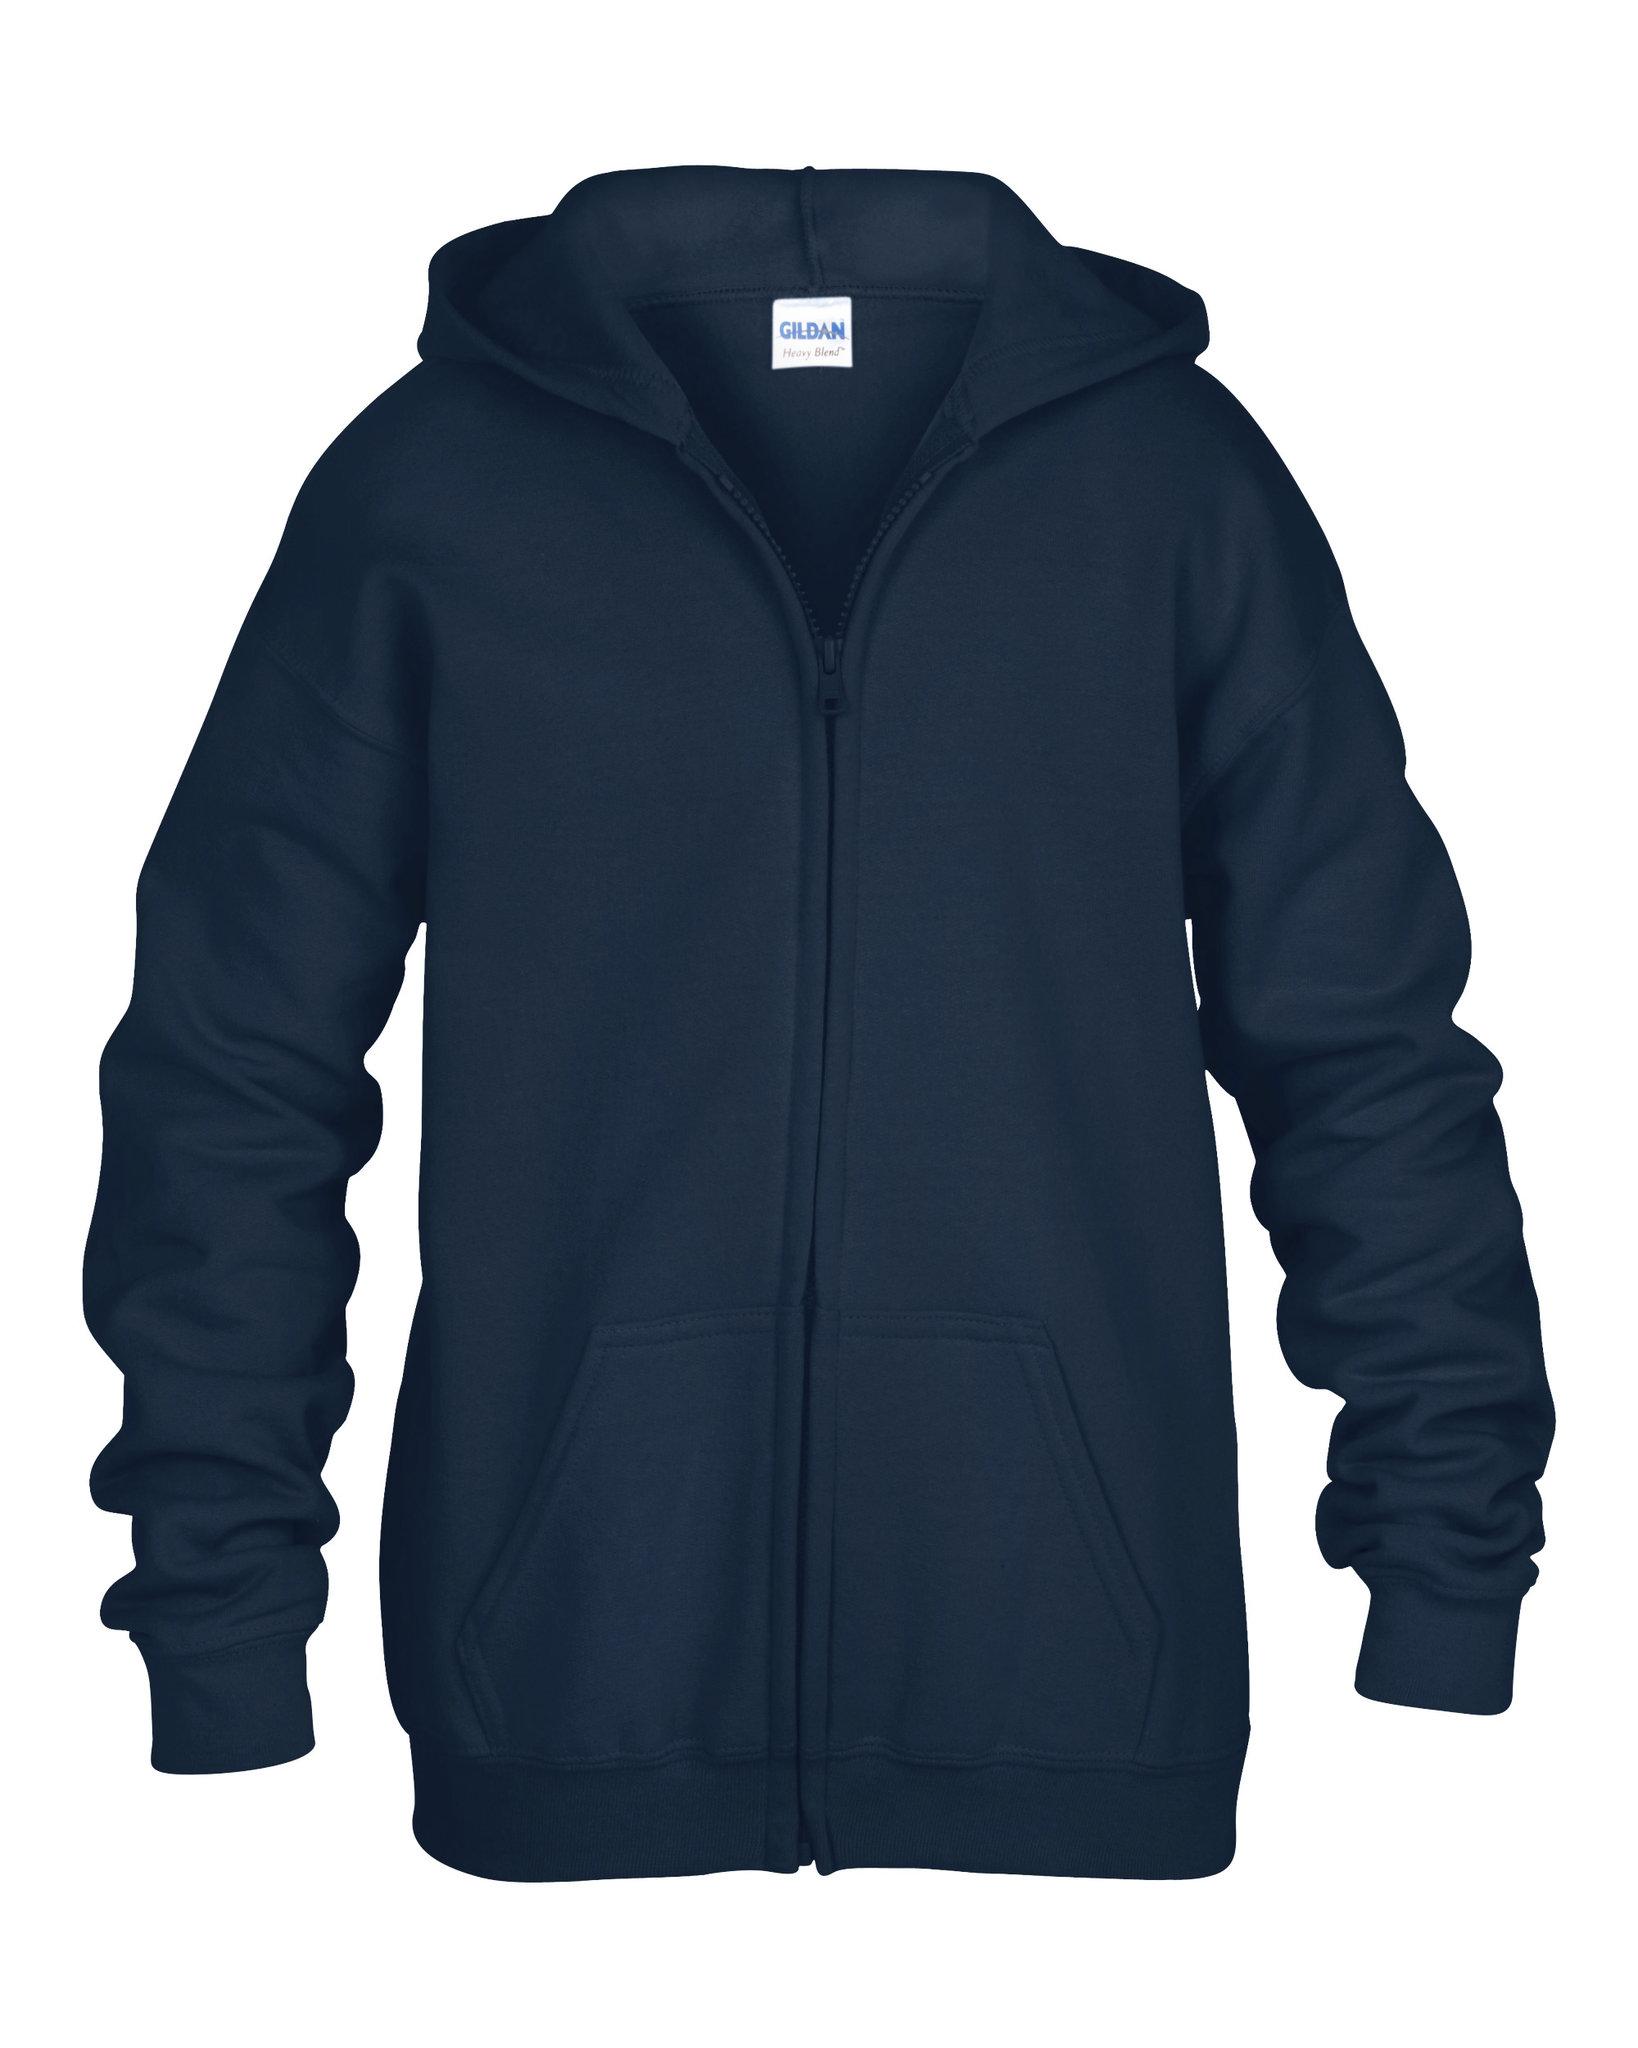 Sweatshirt promotionnel Full Hoody noir enfant - sweatshirt personnalisable